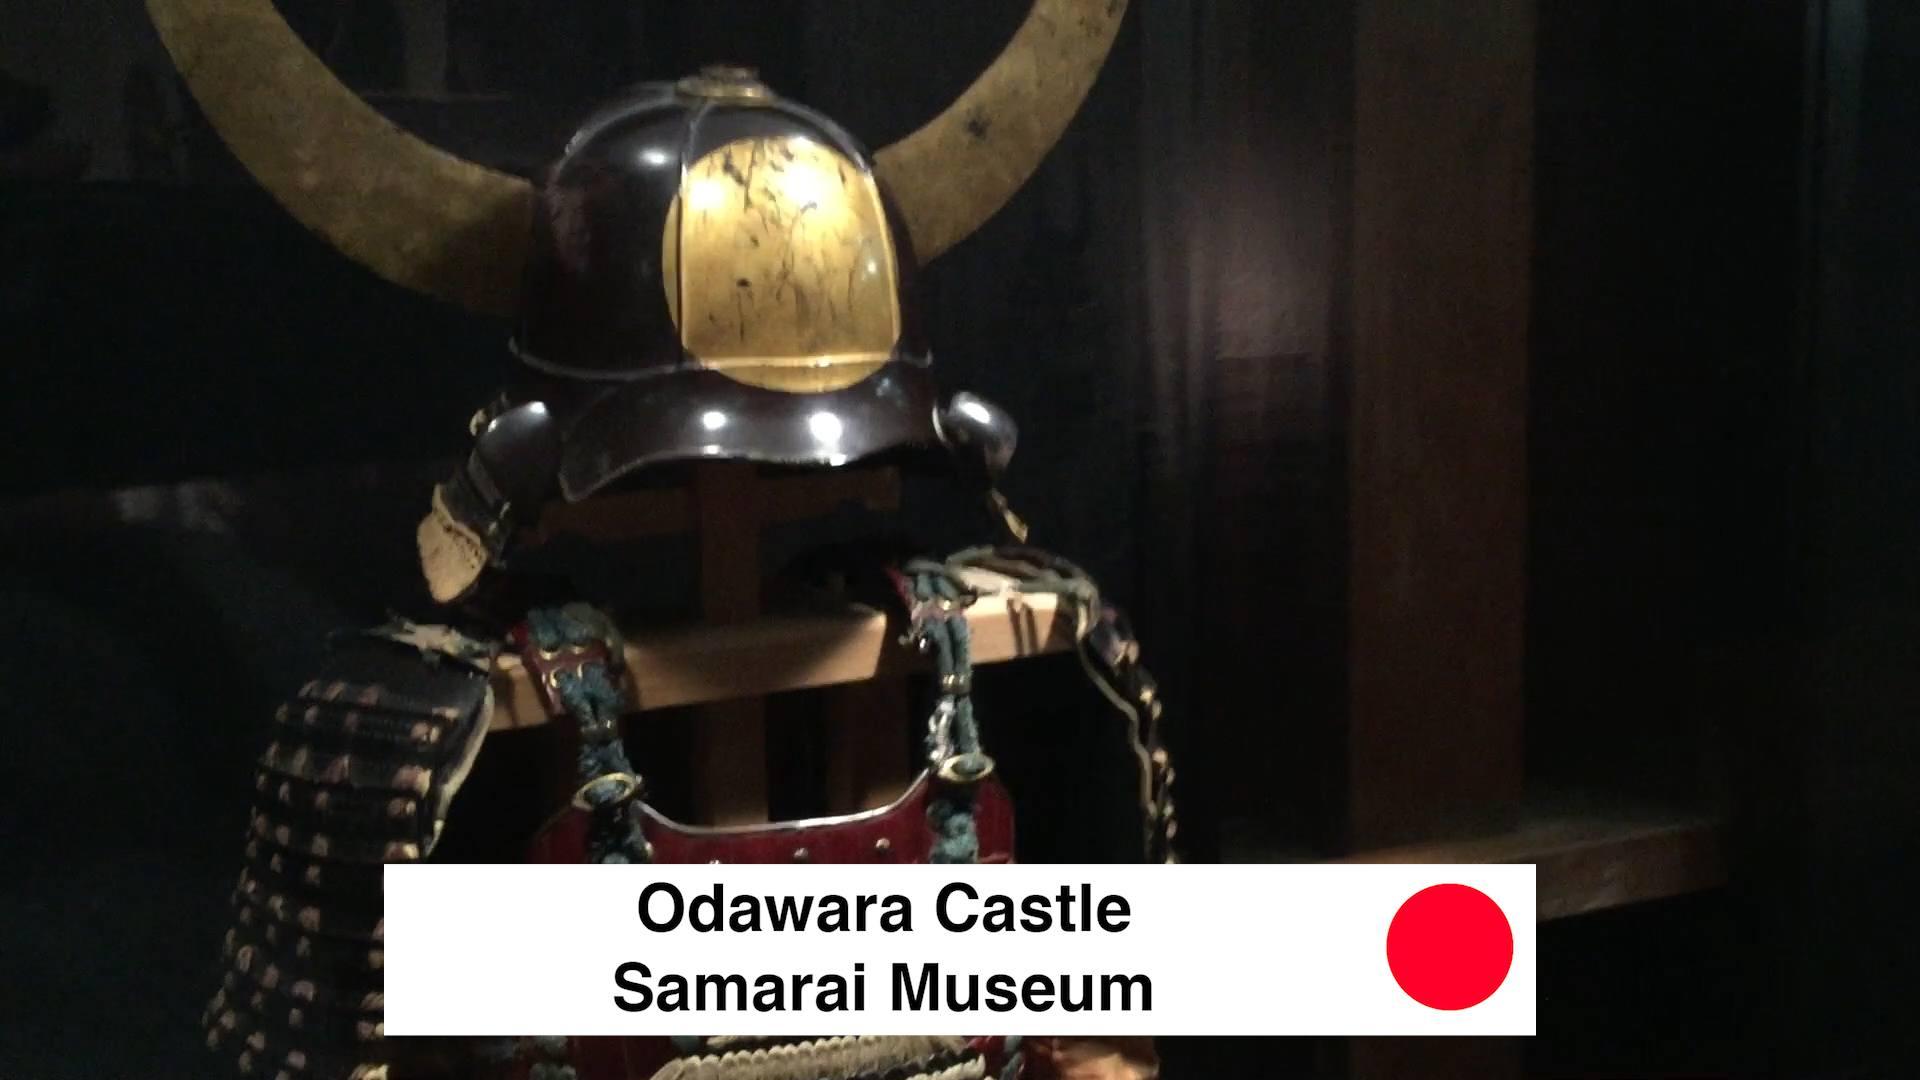 Odawara Castle Samurai Museum - Odawara Castle Japan Guide Review Video - 9 Reasons To See Odawara Castle Kanagawa Japan 🇯🇵 🏯 🌸